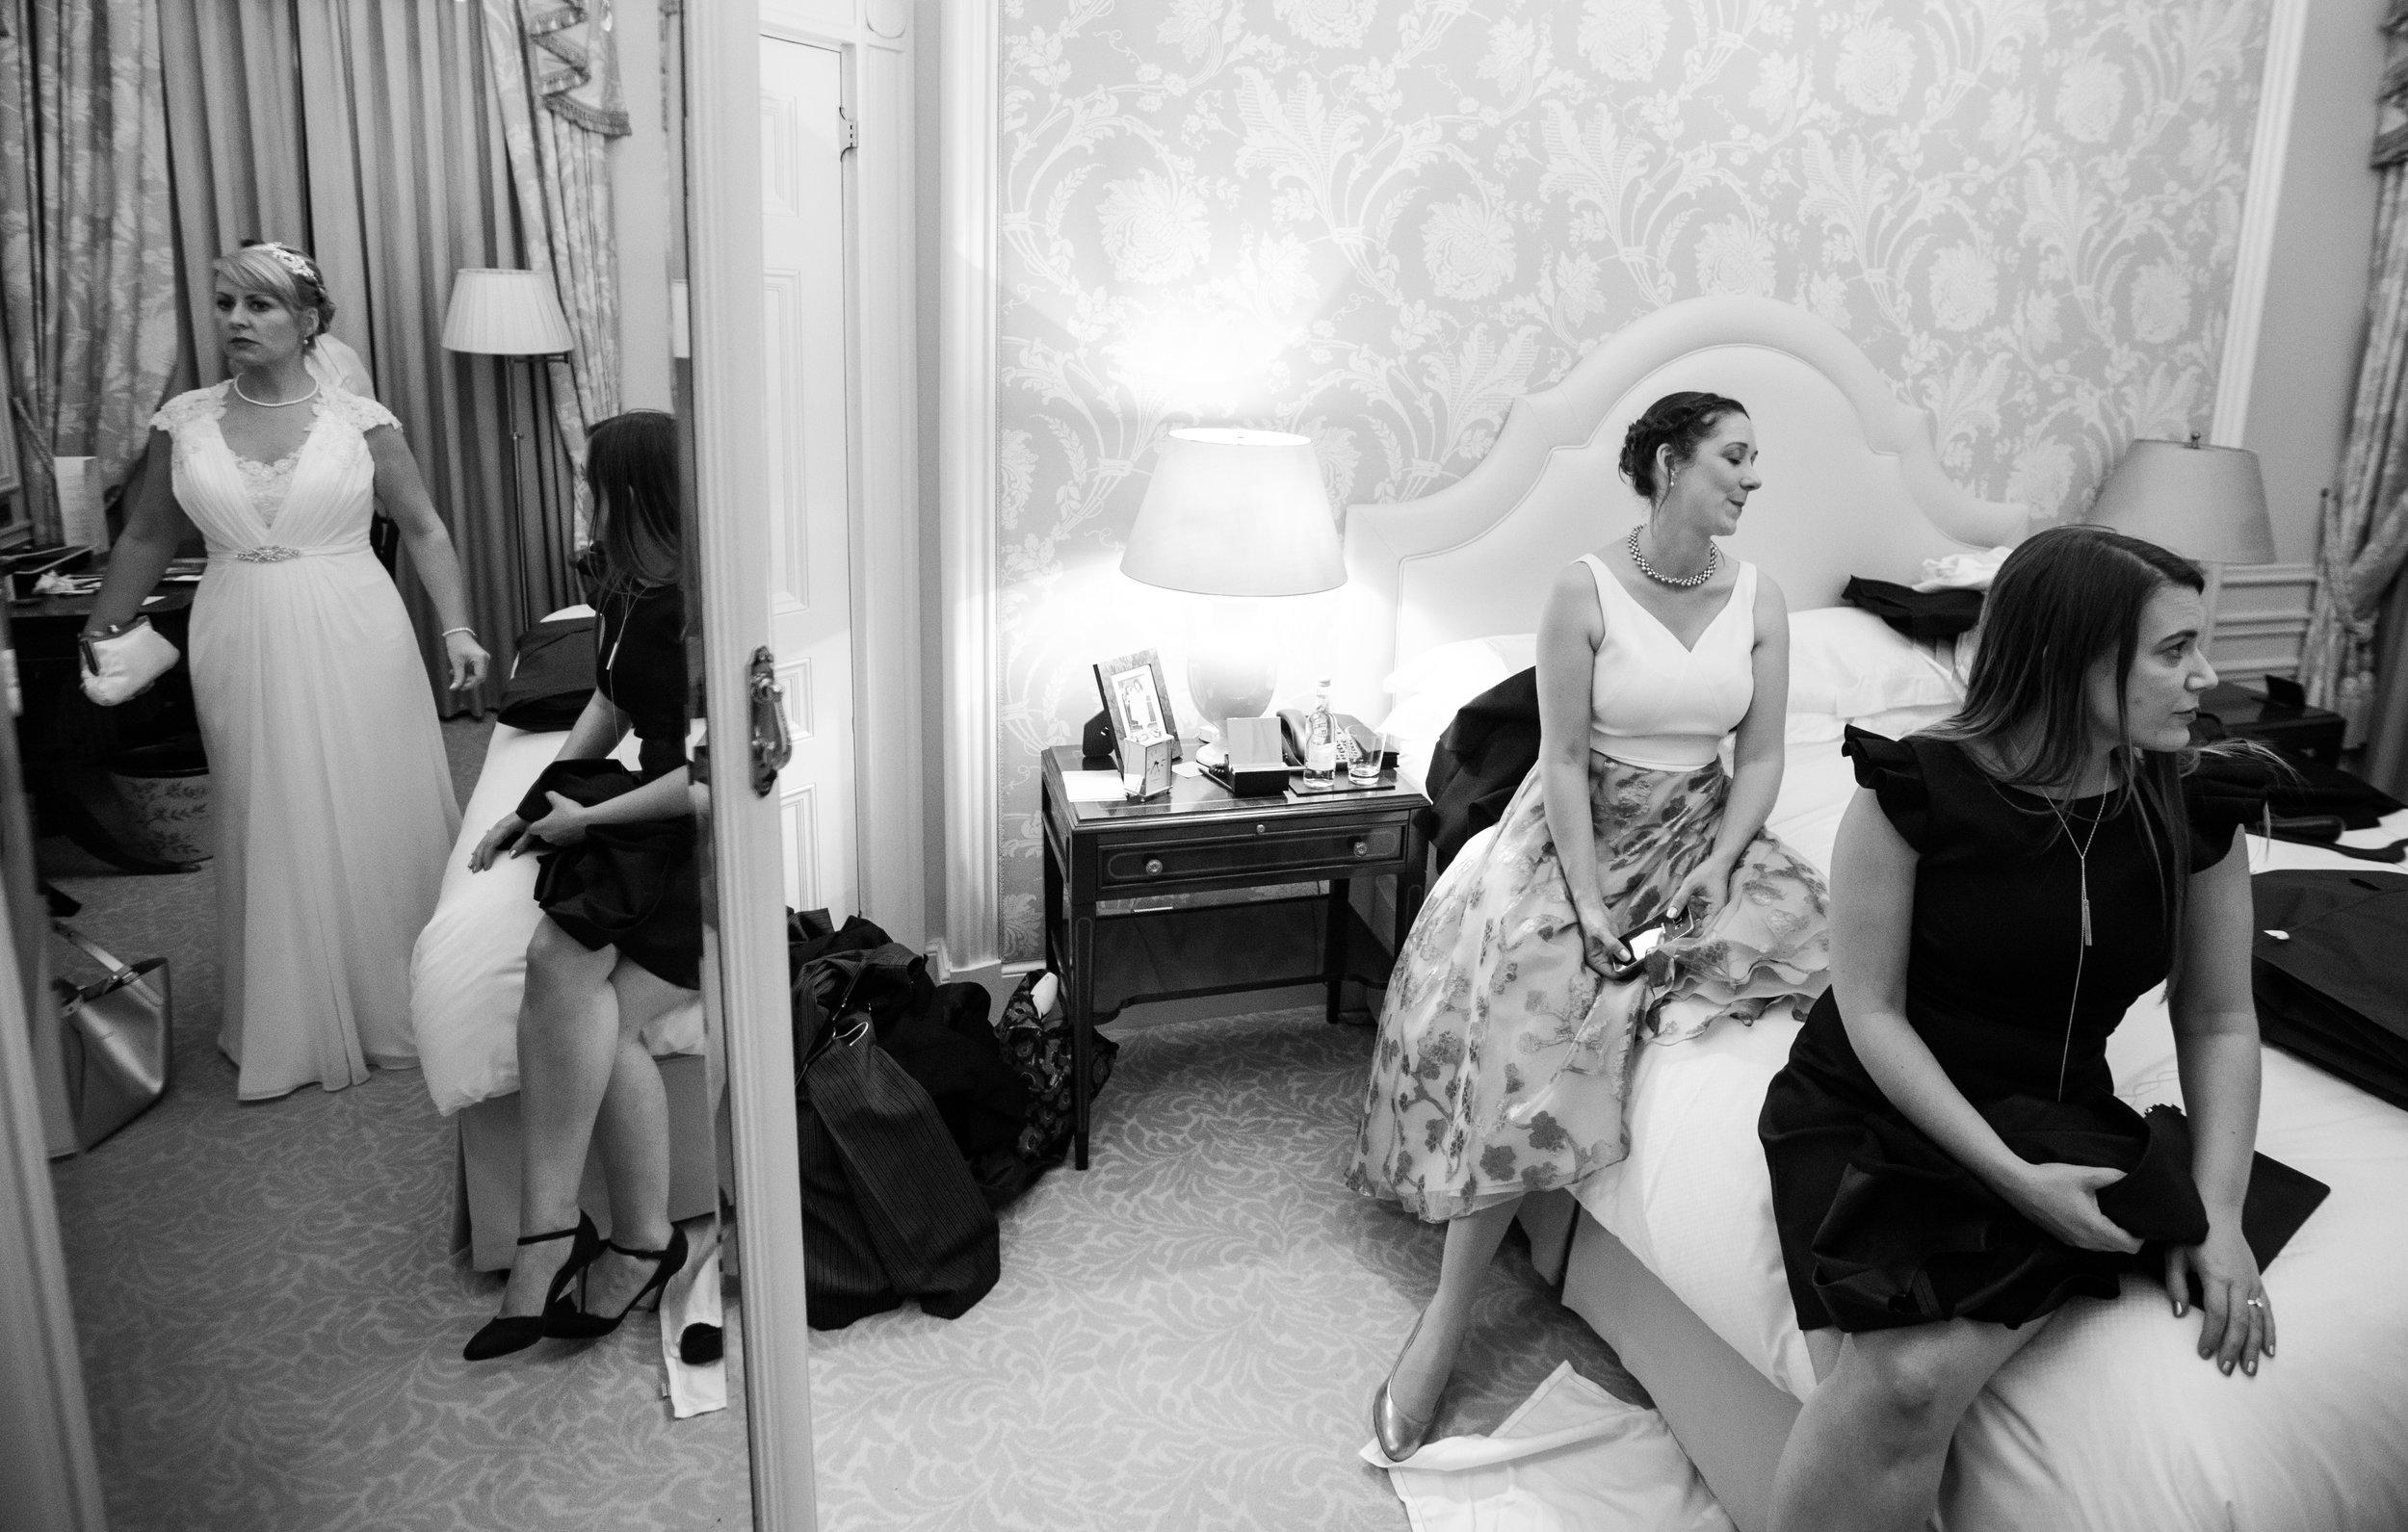 london-wedding-photography-wimbledon-wandsworth-town-hall-savoy-hotel-room-party-prep-chaos-93